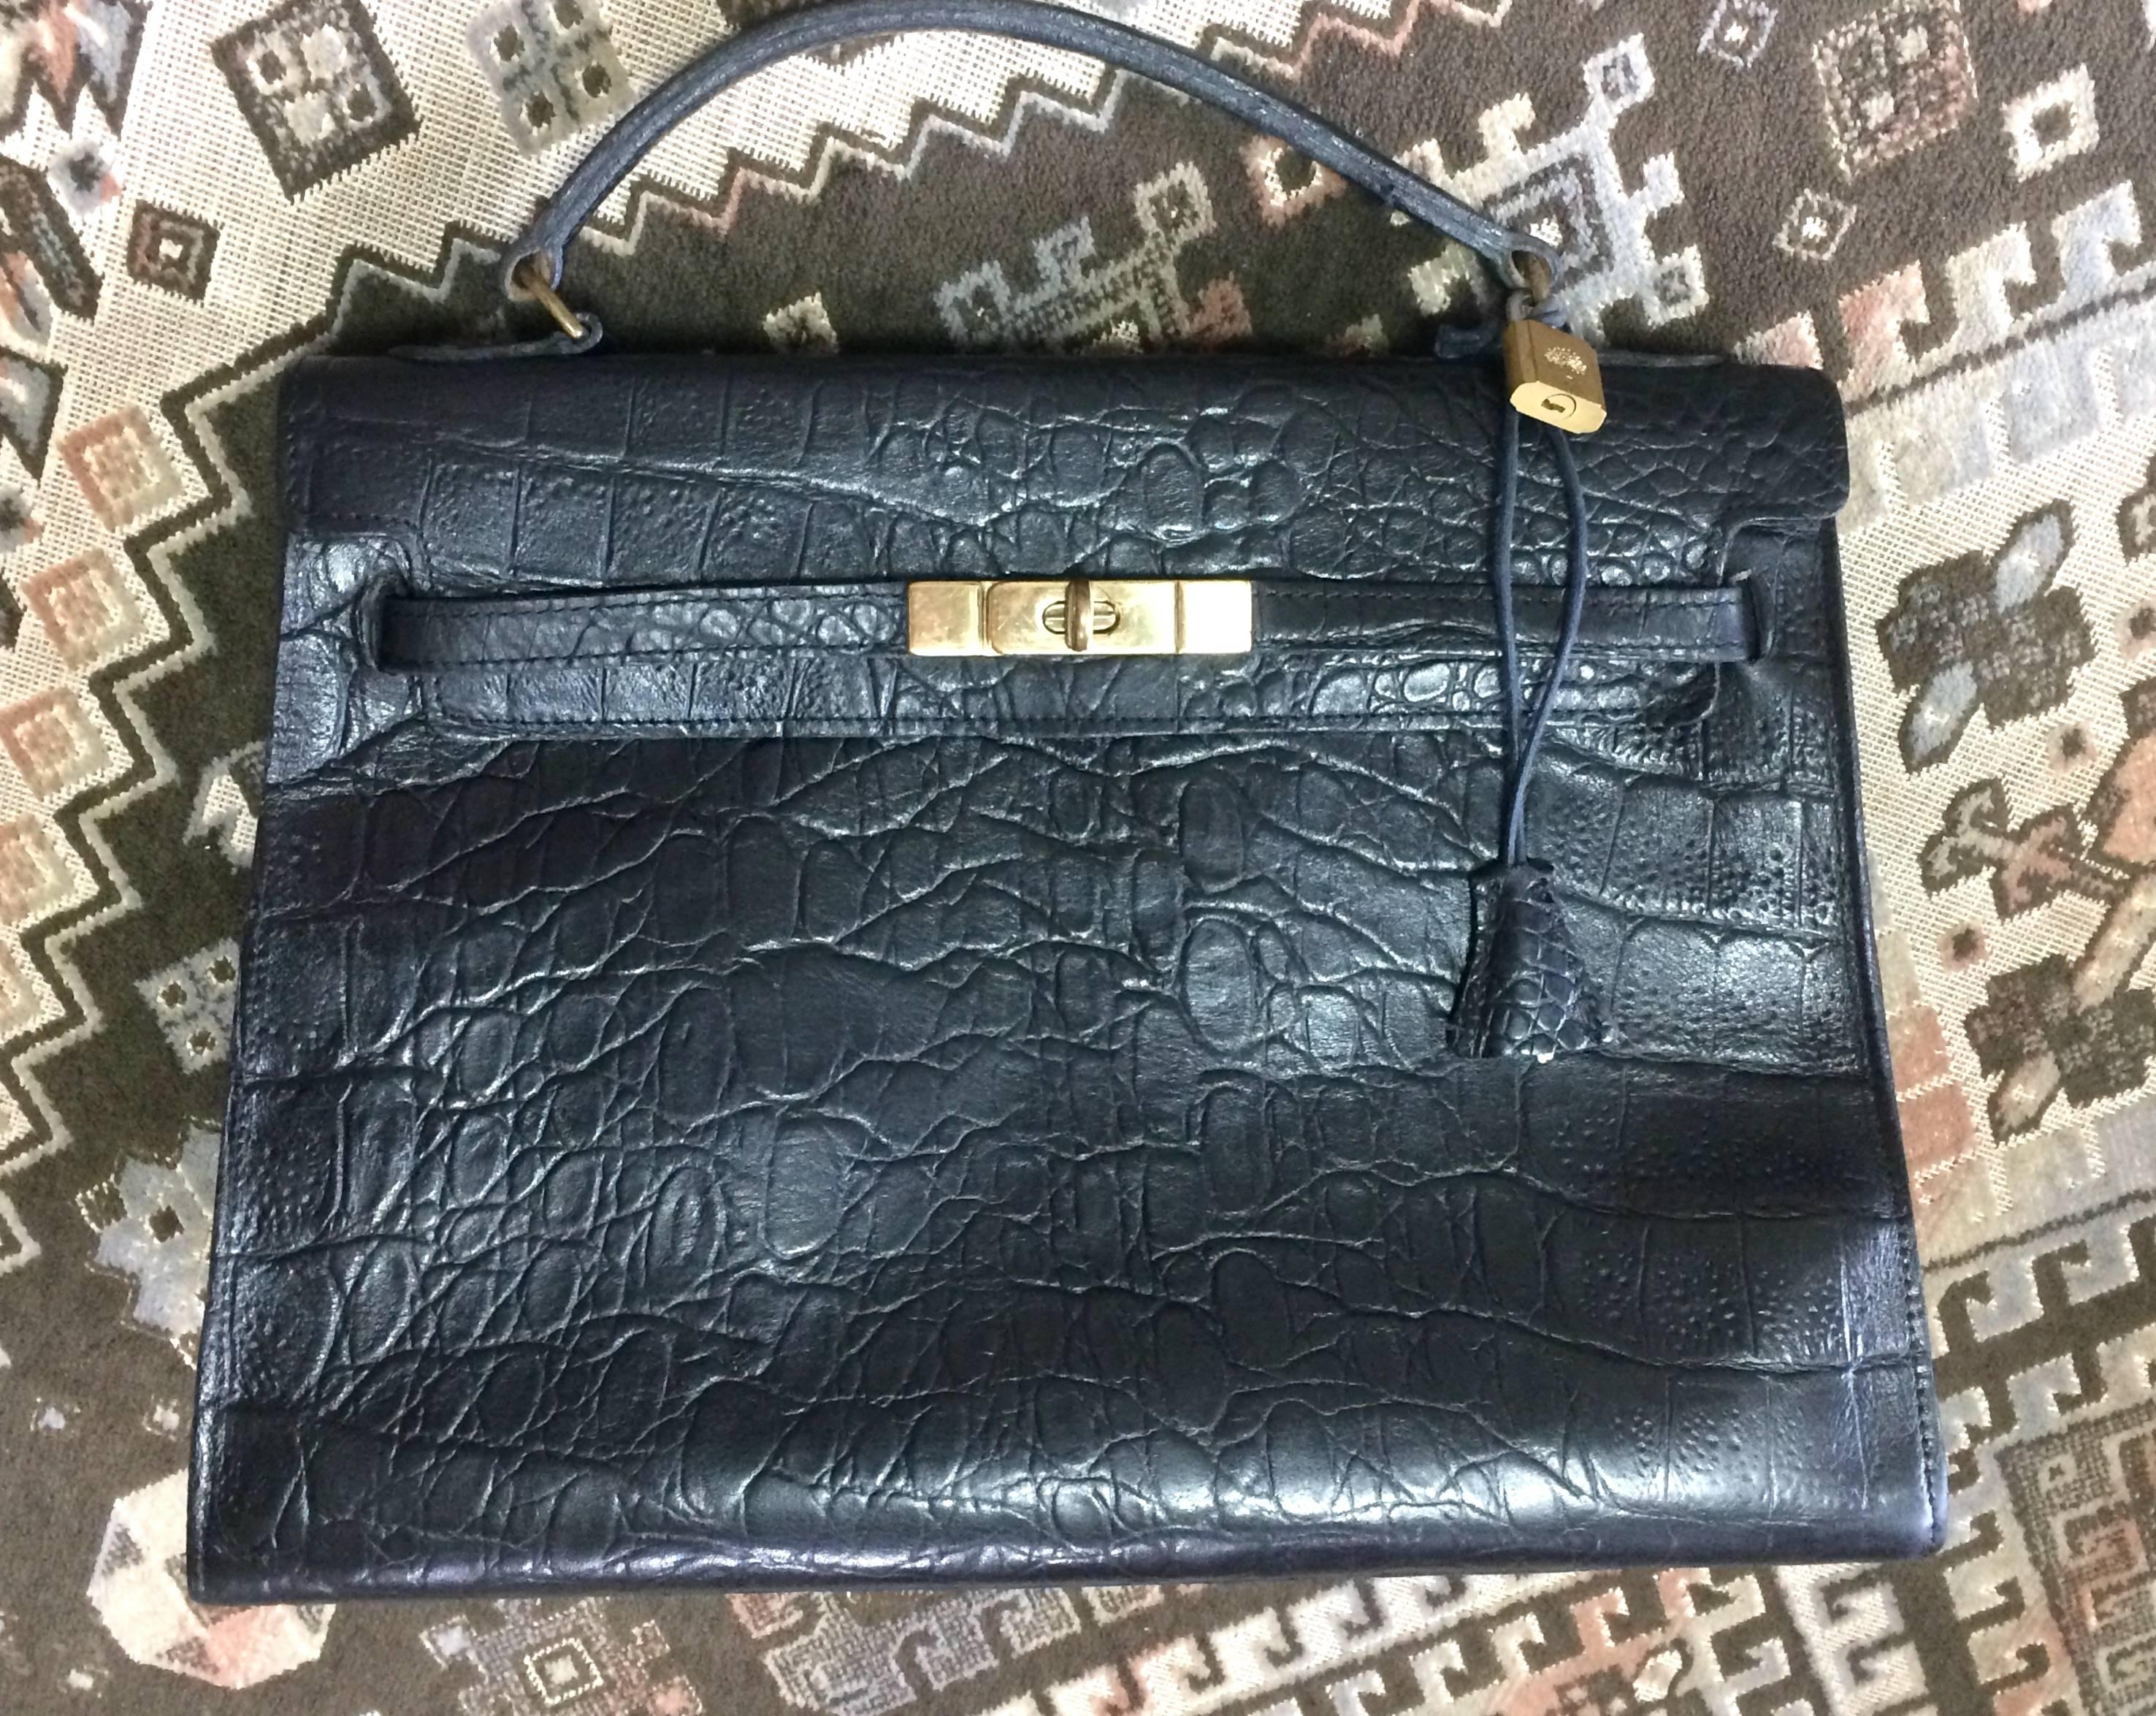 c34d62f900b5 ... brown 60496 fd877 sweden vintage mulberry croc embossed black leather  kelly bag. classic handbag from roger saul d41f8 ...